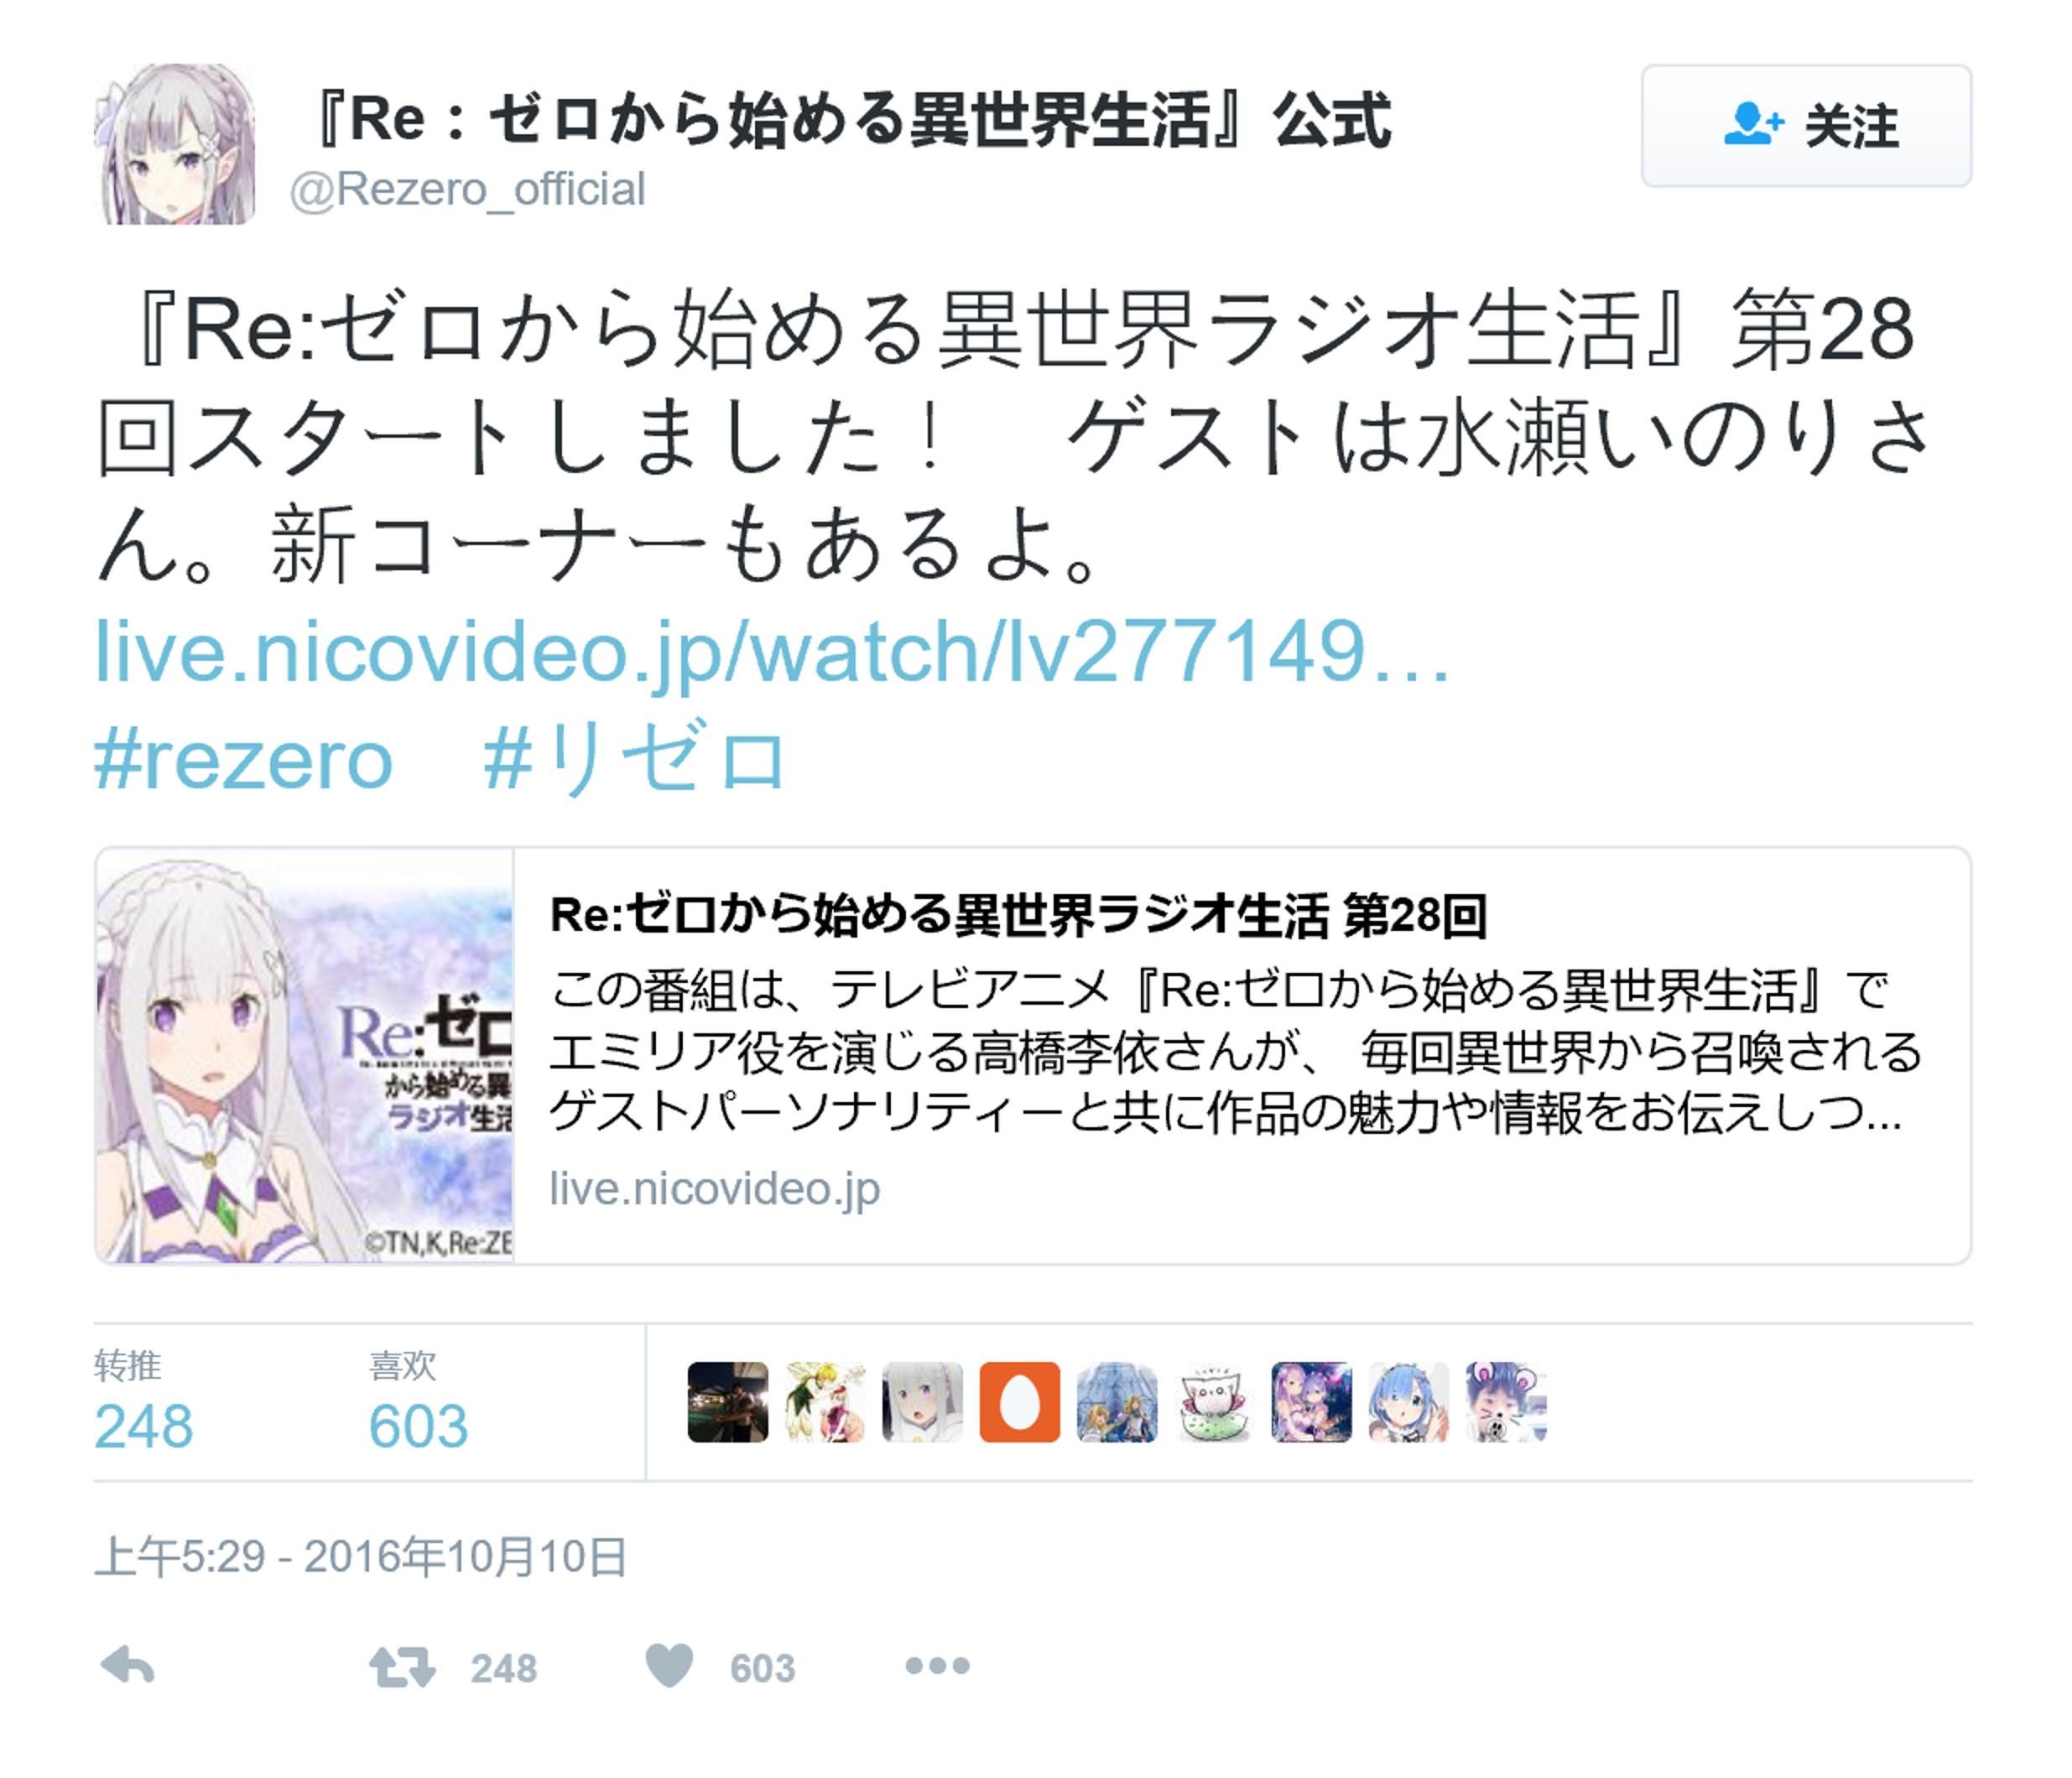 《Re:0》第26话电台节目